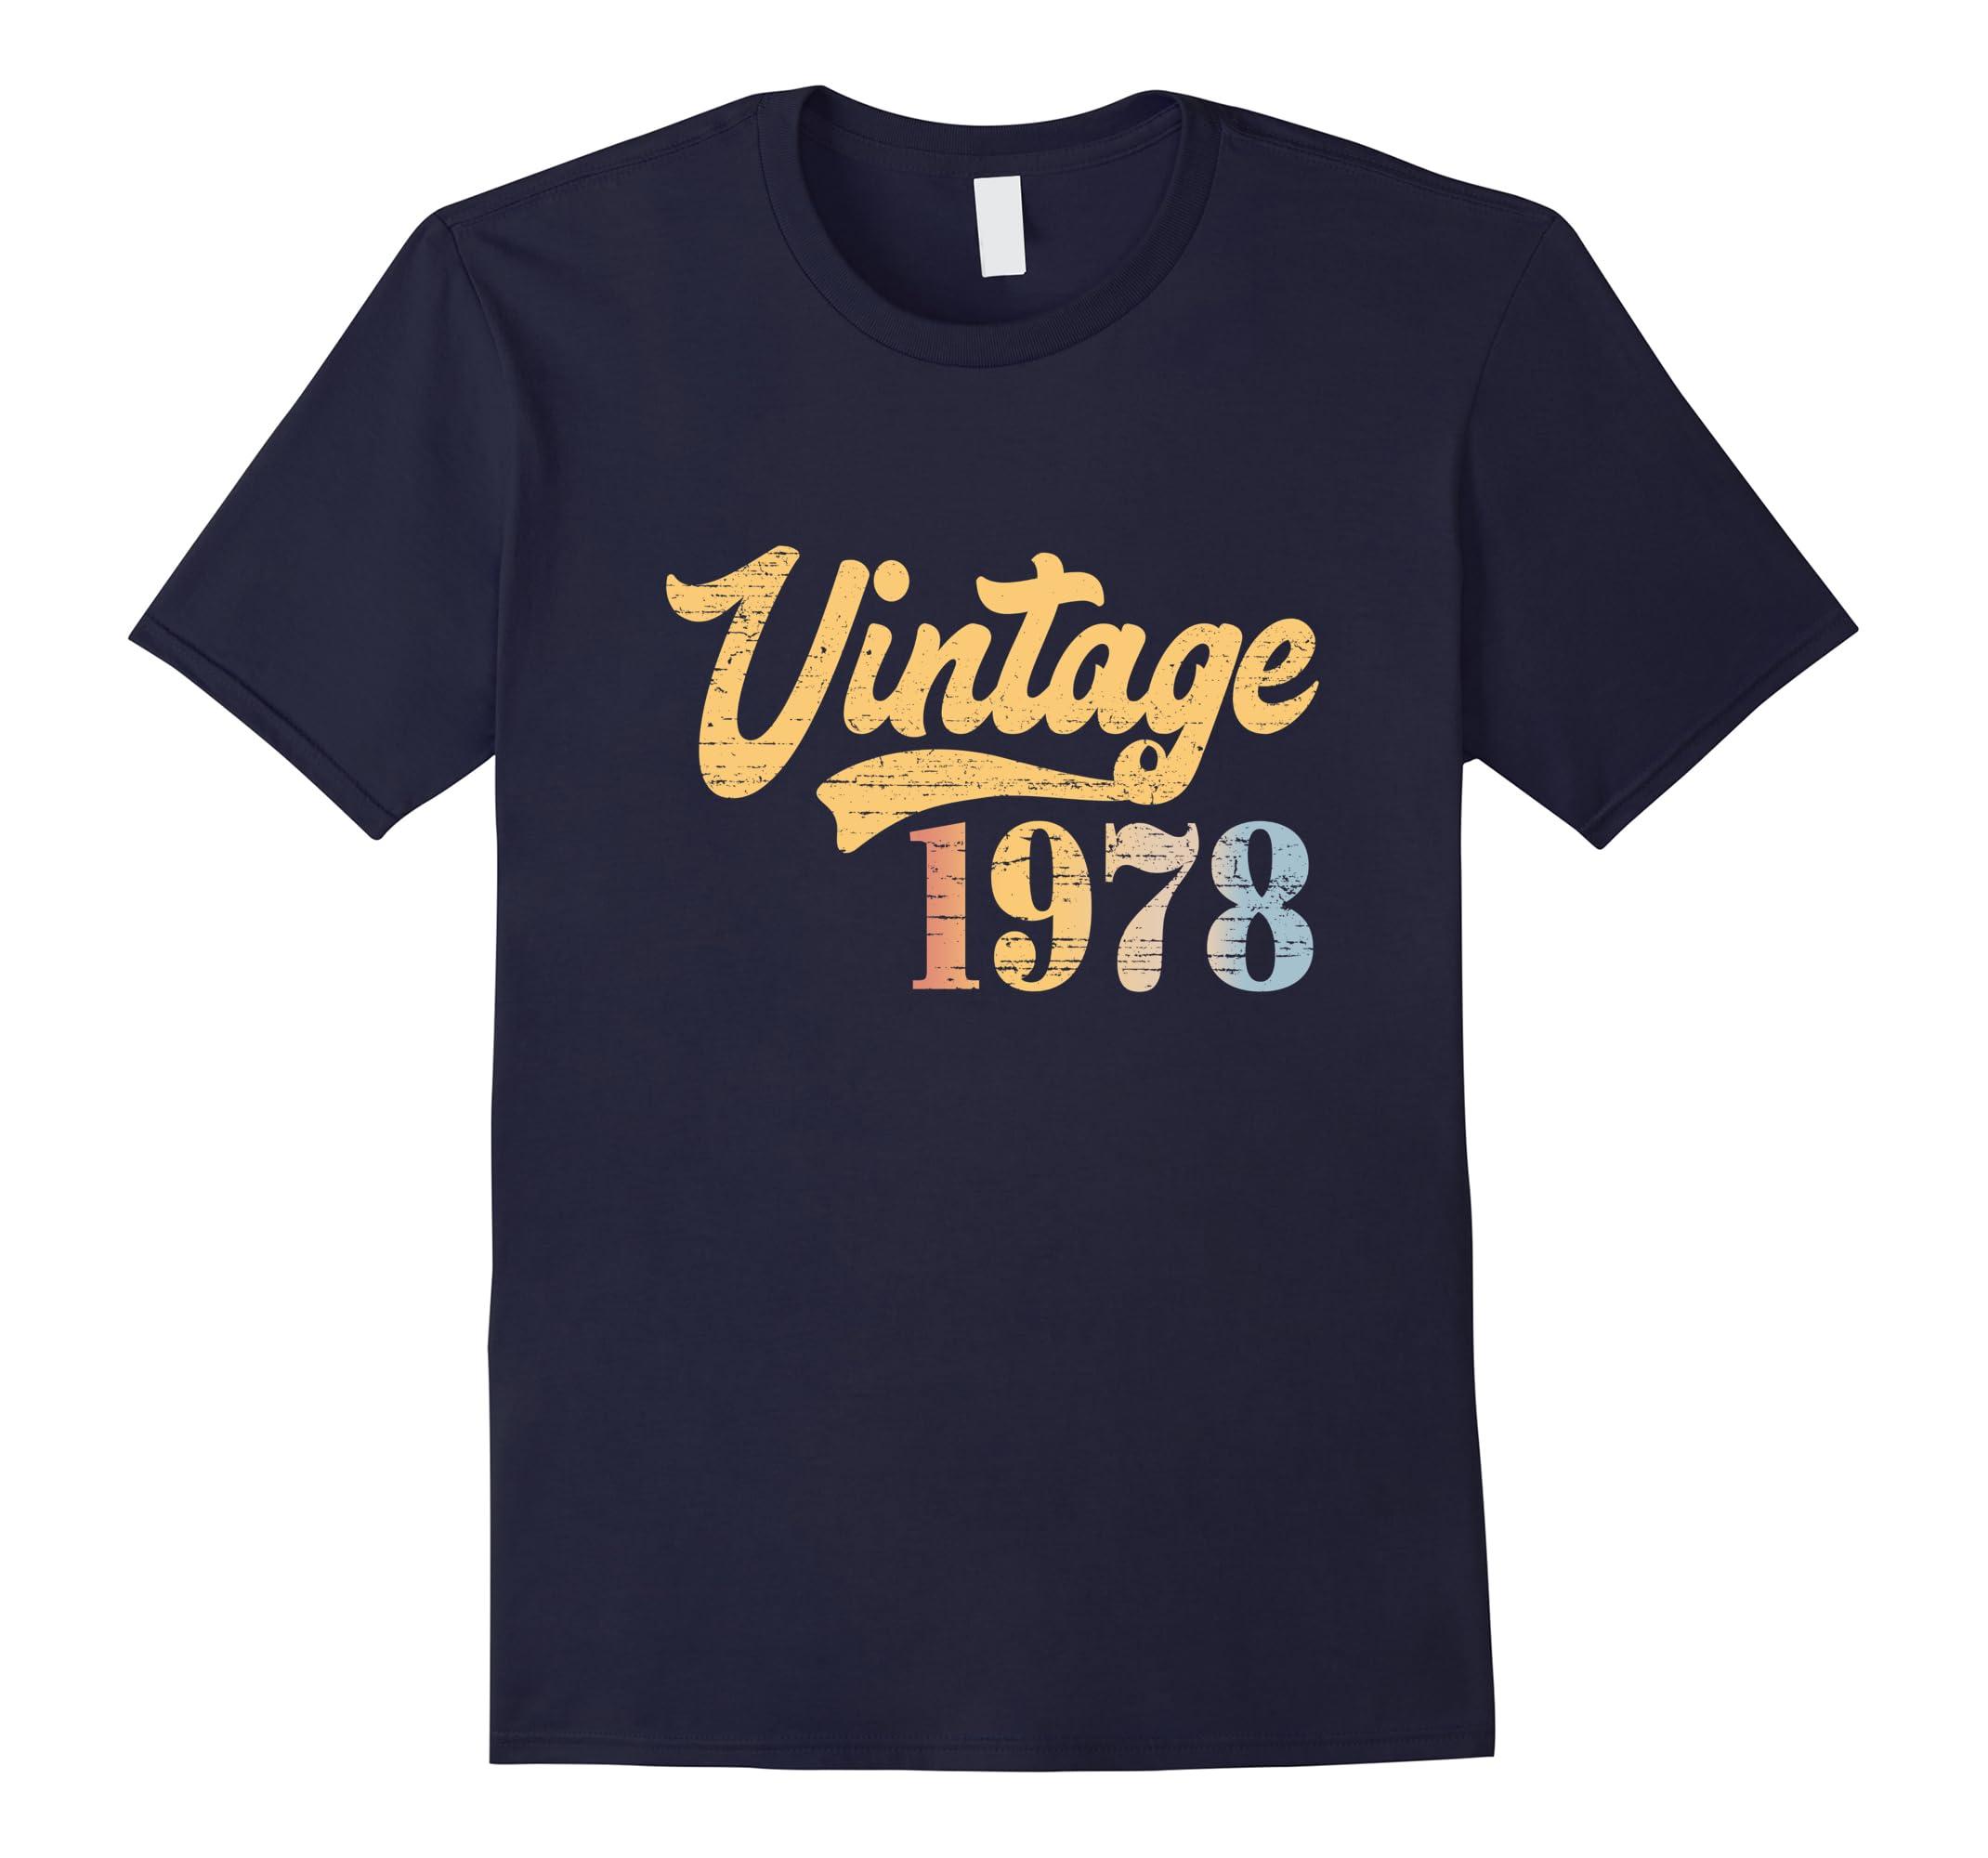 40 Years Old T-Shirt. 40th Birthday Tee For Men/Women.-RT